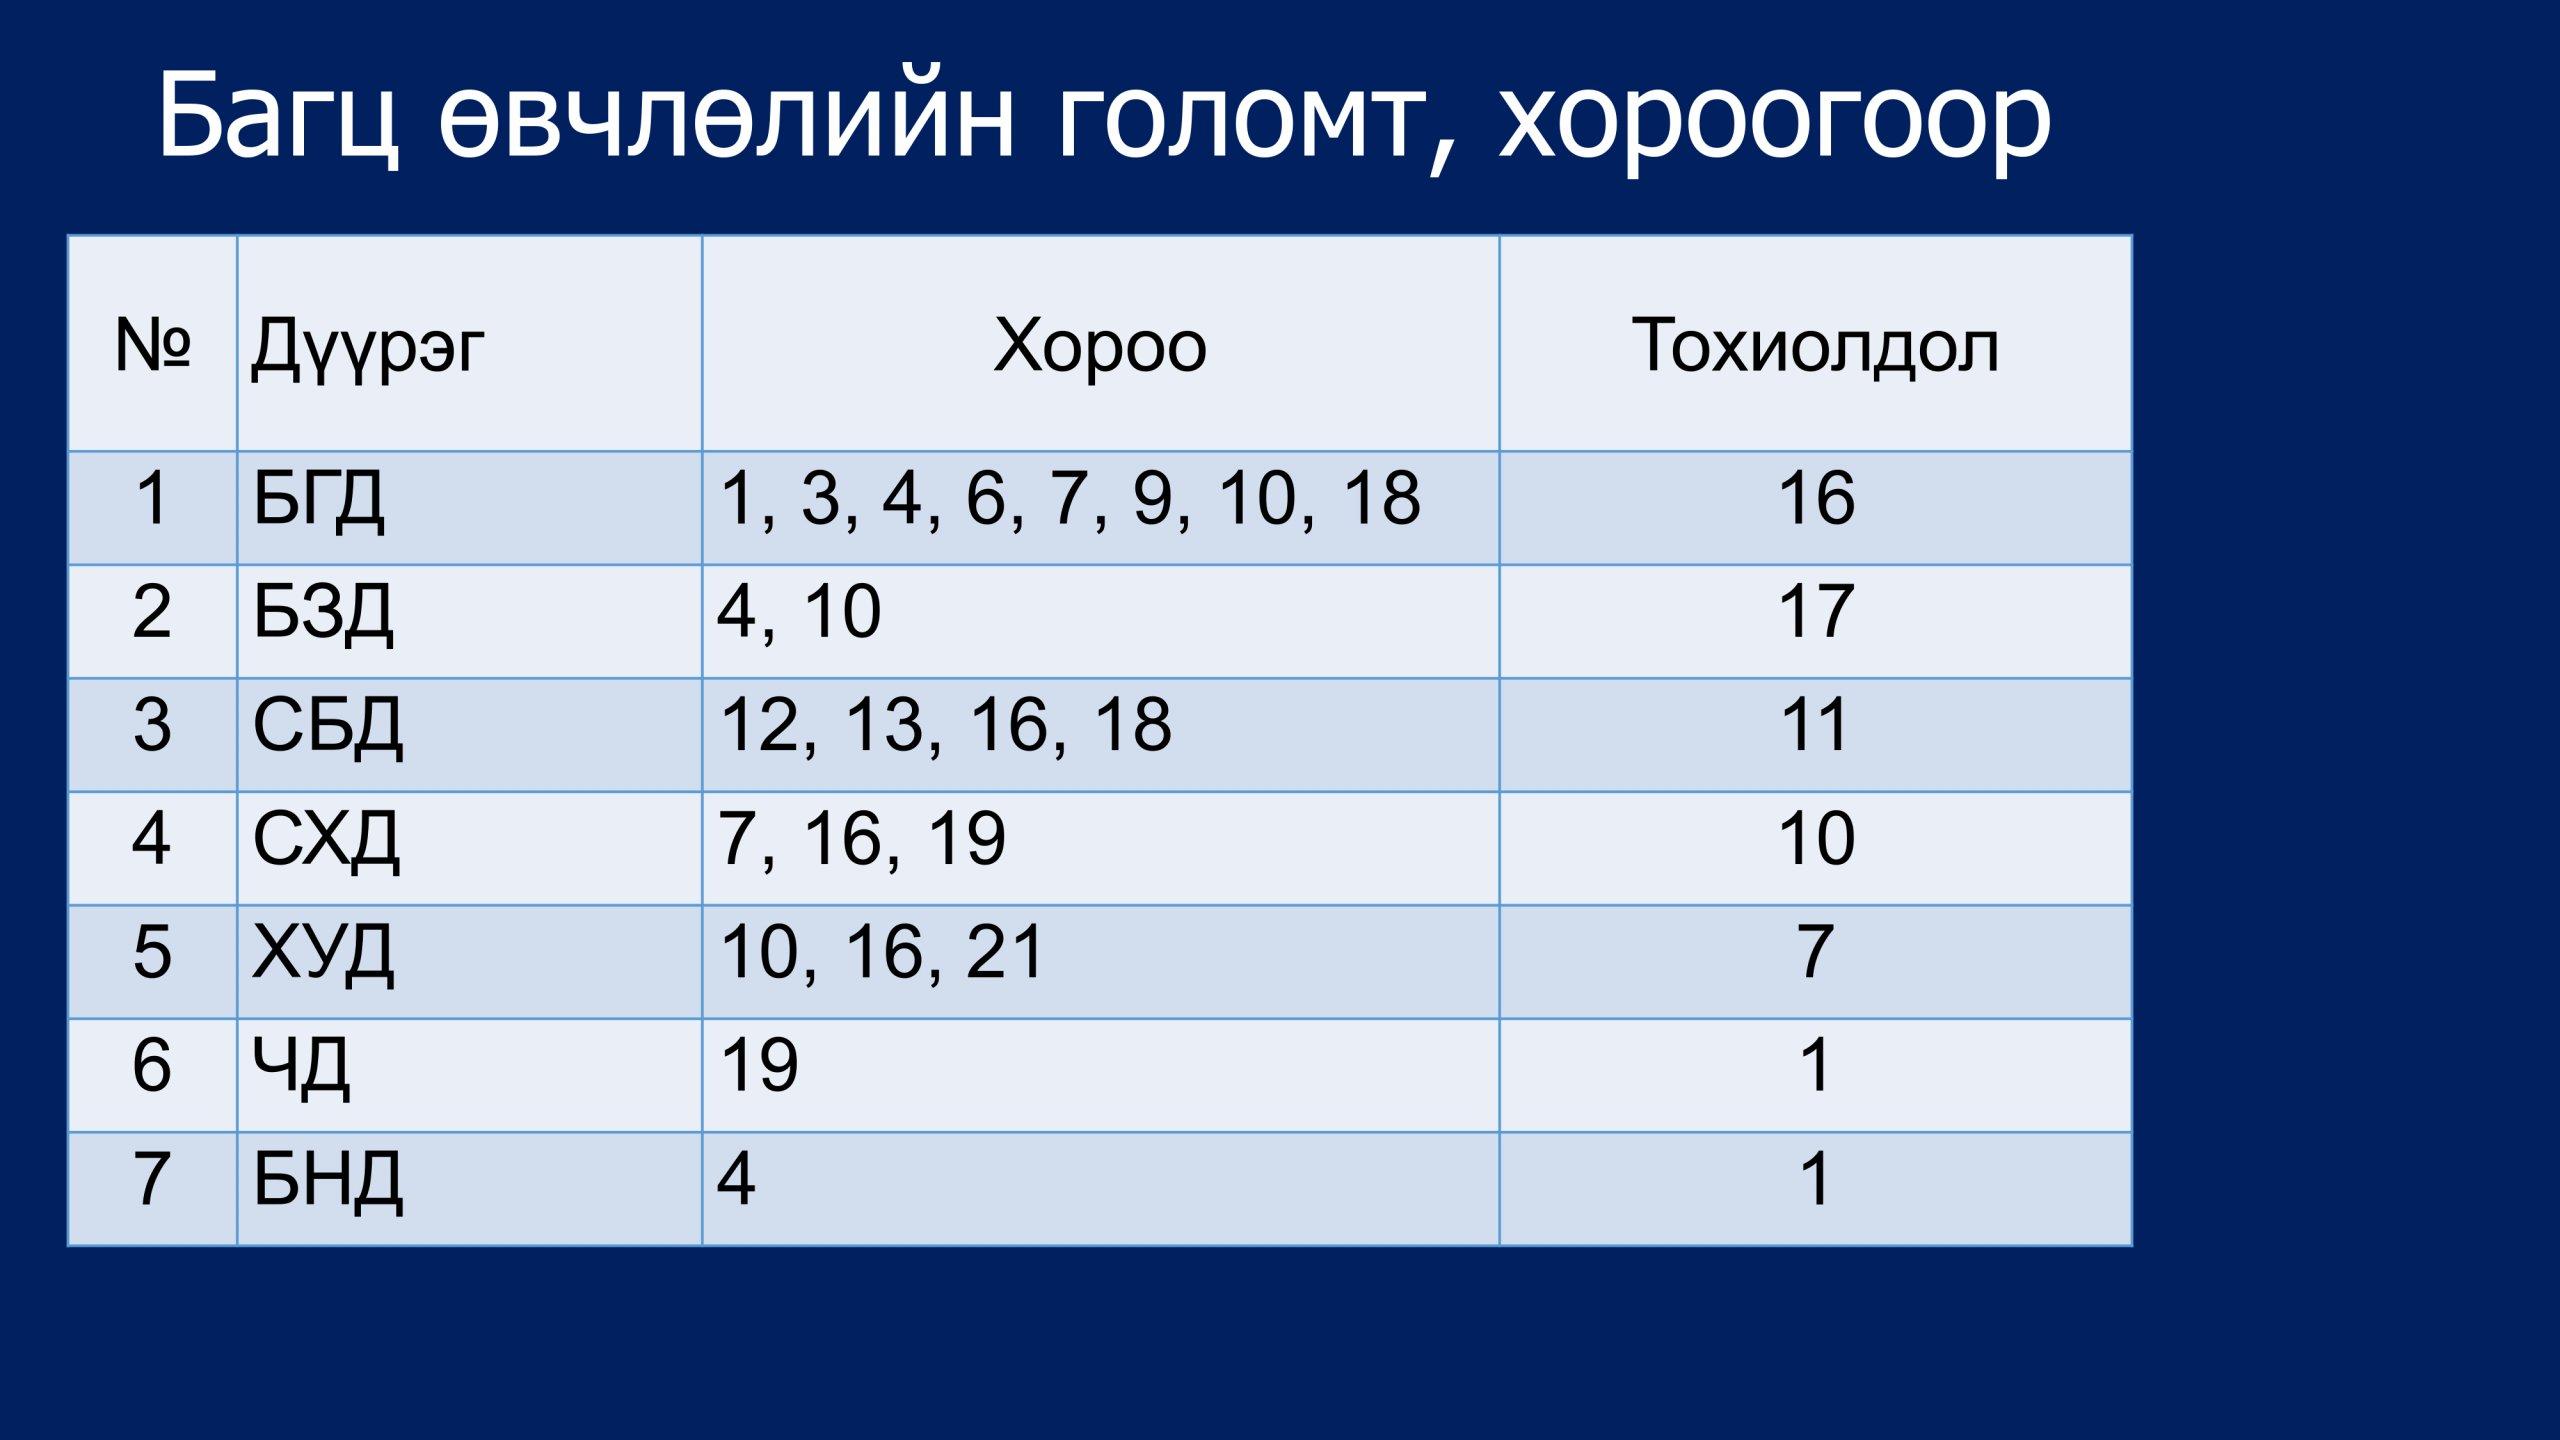 PPT-2020.11.26-6